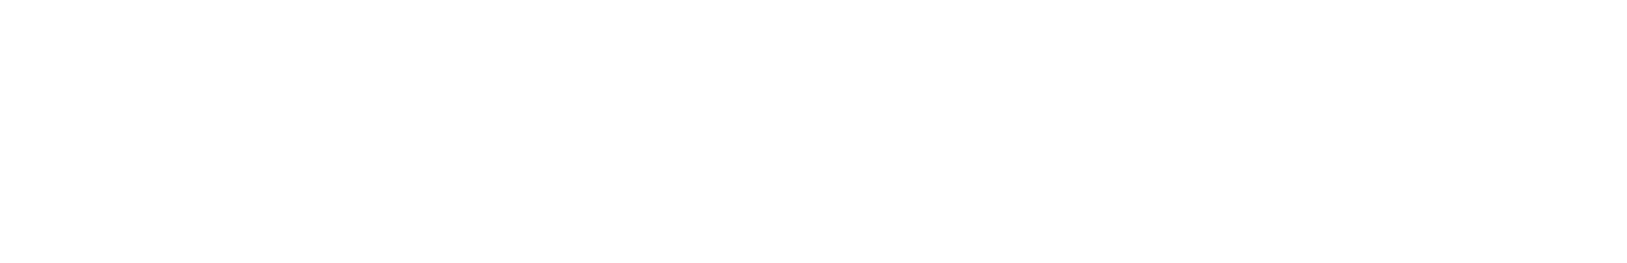 OLG Engineering logo